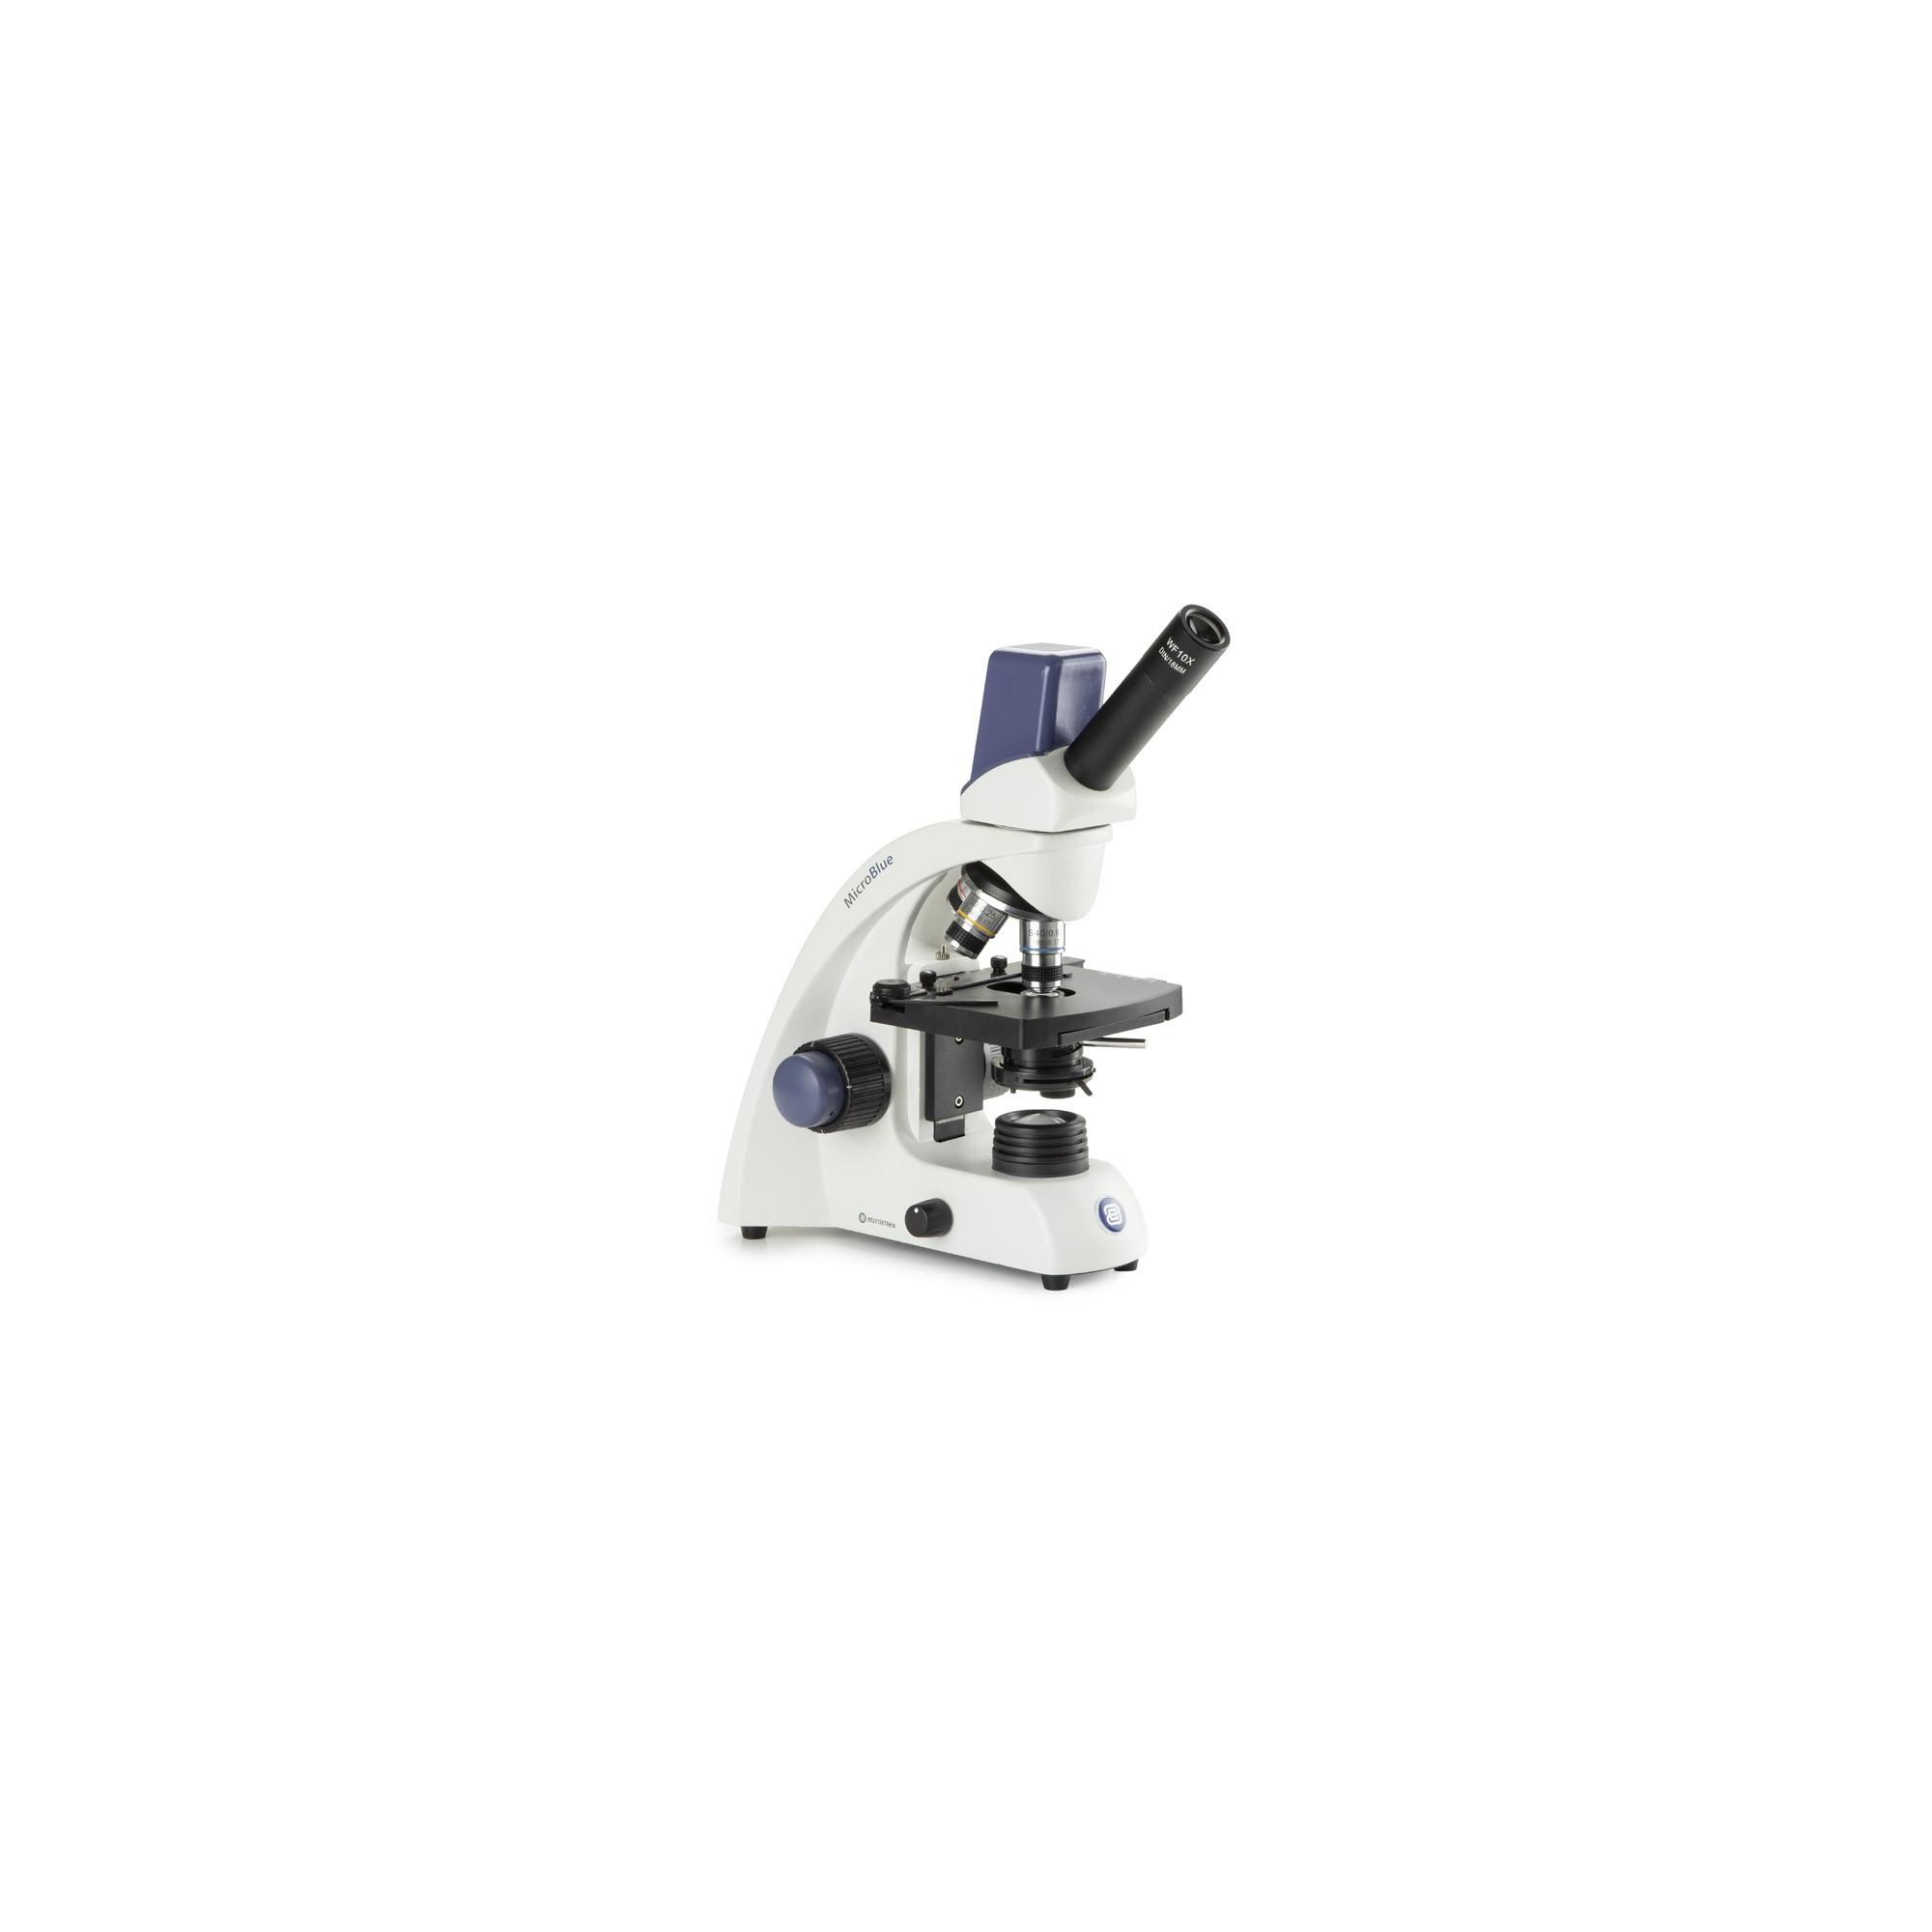 MICROSCOPIO DIGITAL MONOCULAR MICROBLUE MODELO 1055